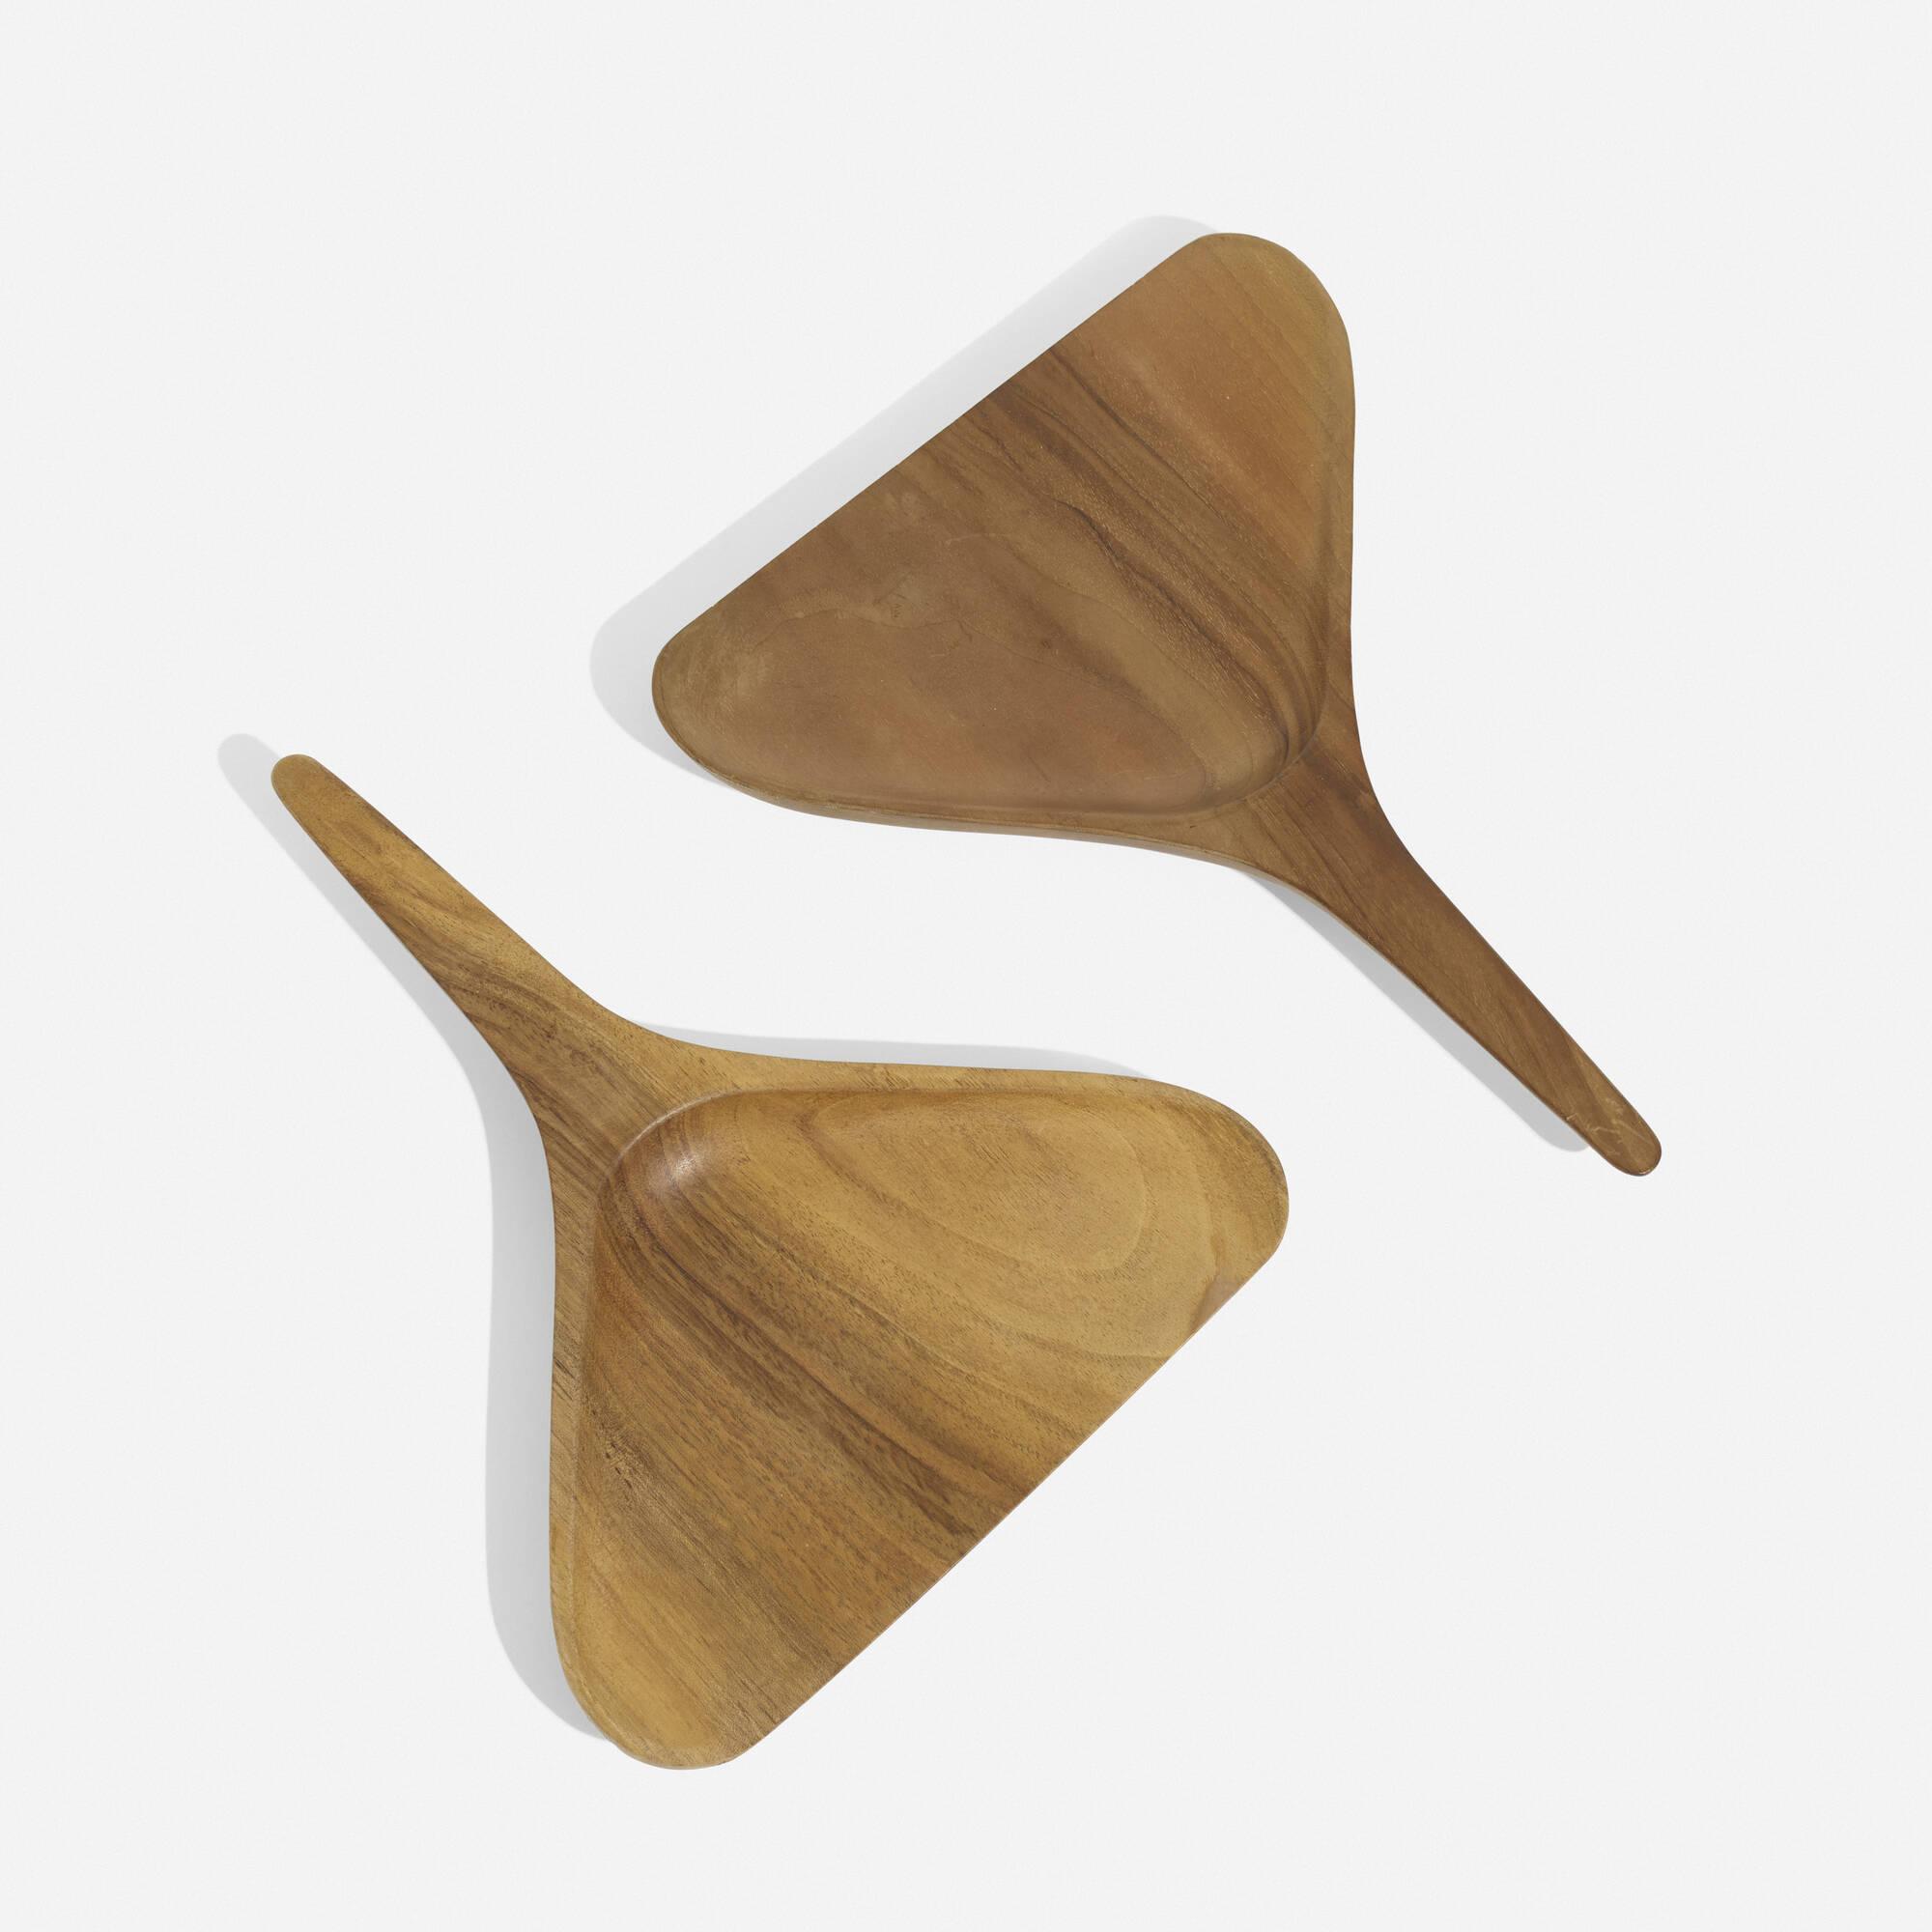 243: Carl Auböck III / dustpans, pair (1 of 1)